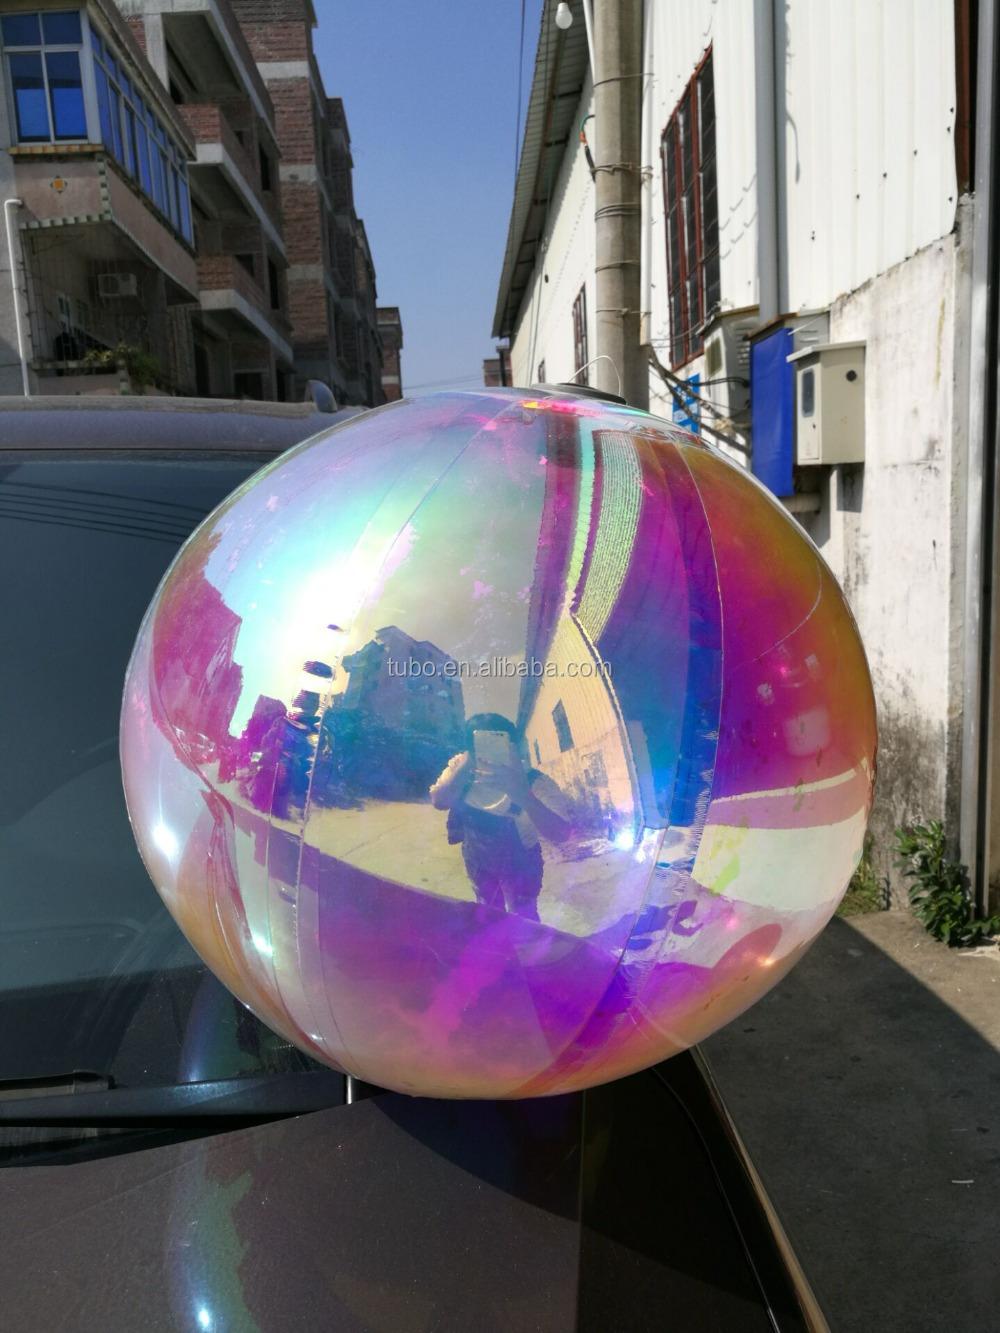 New-Design-Colorful-Decoration-Inflatable-Mirror-Ball-Customized-Reflective-Beautiful-Wedding-Ball-Fashion-Novel-Wild-Ball.jpg